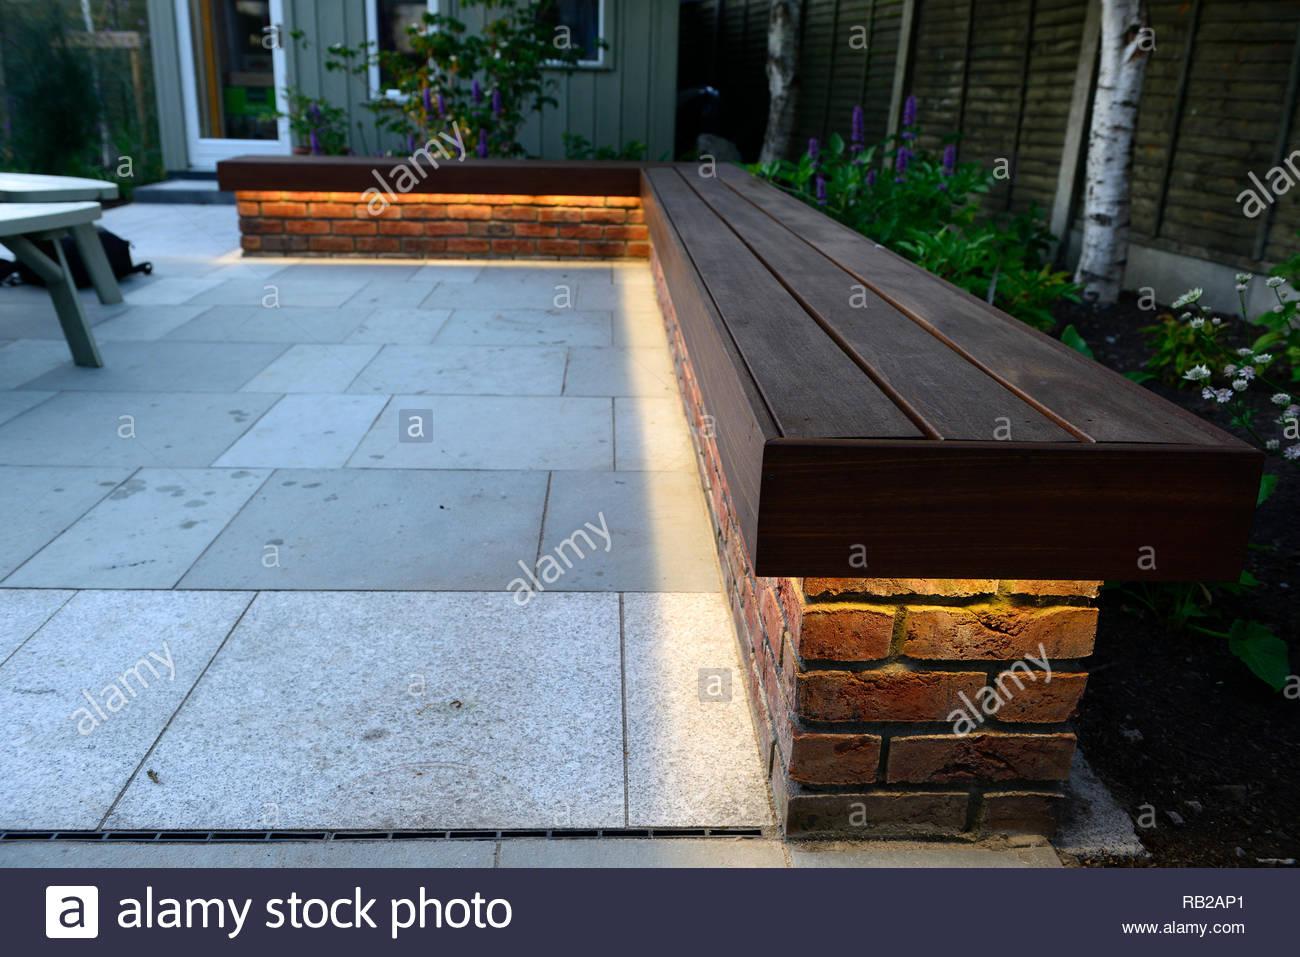 redbrick seating,wooden seating,downlight,downlighting,illuminate,illuminated,evening,dusk,patio feature,garden feature,small garden,gardens,RM Floral - Stock Image